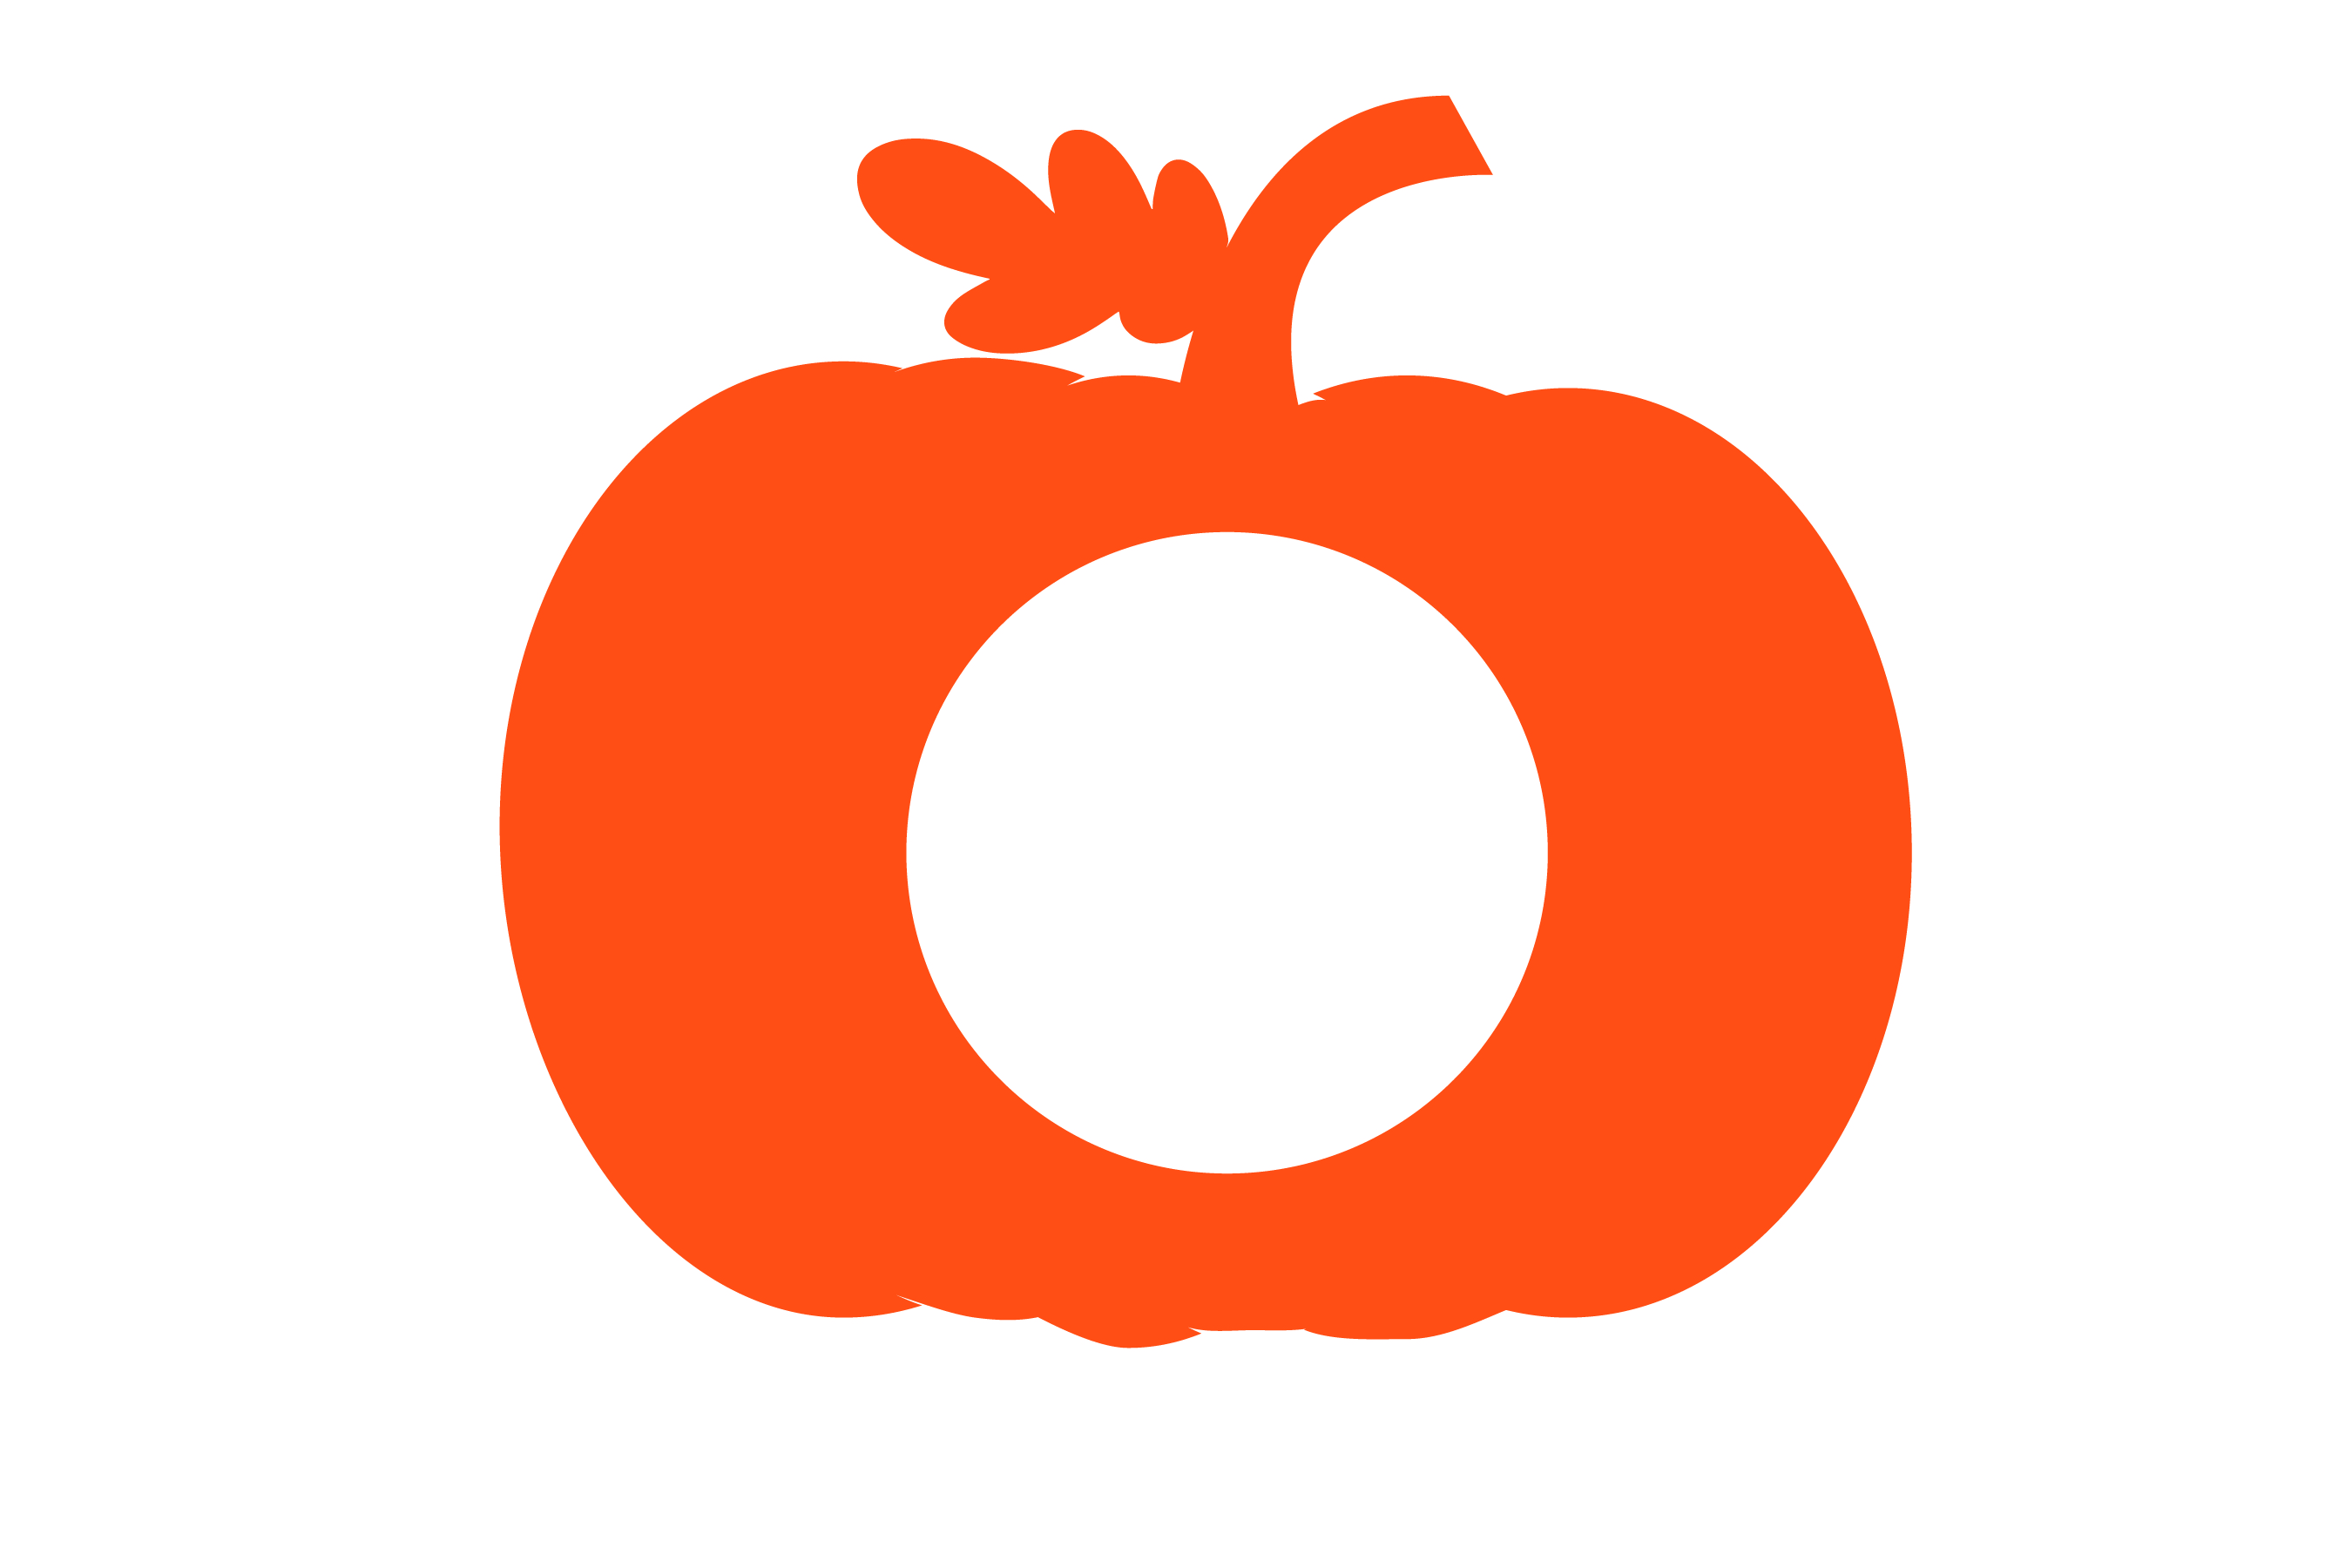 Pumpkin patch - Pumpkin Monogram 5 Designs SVG cut File example image 3